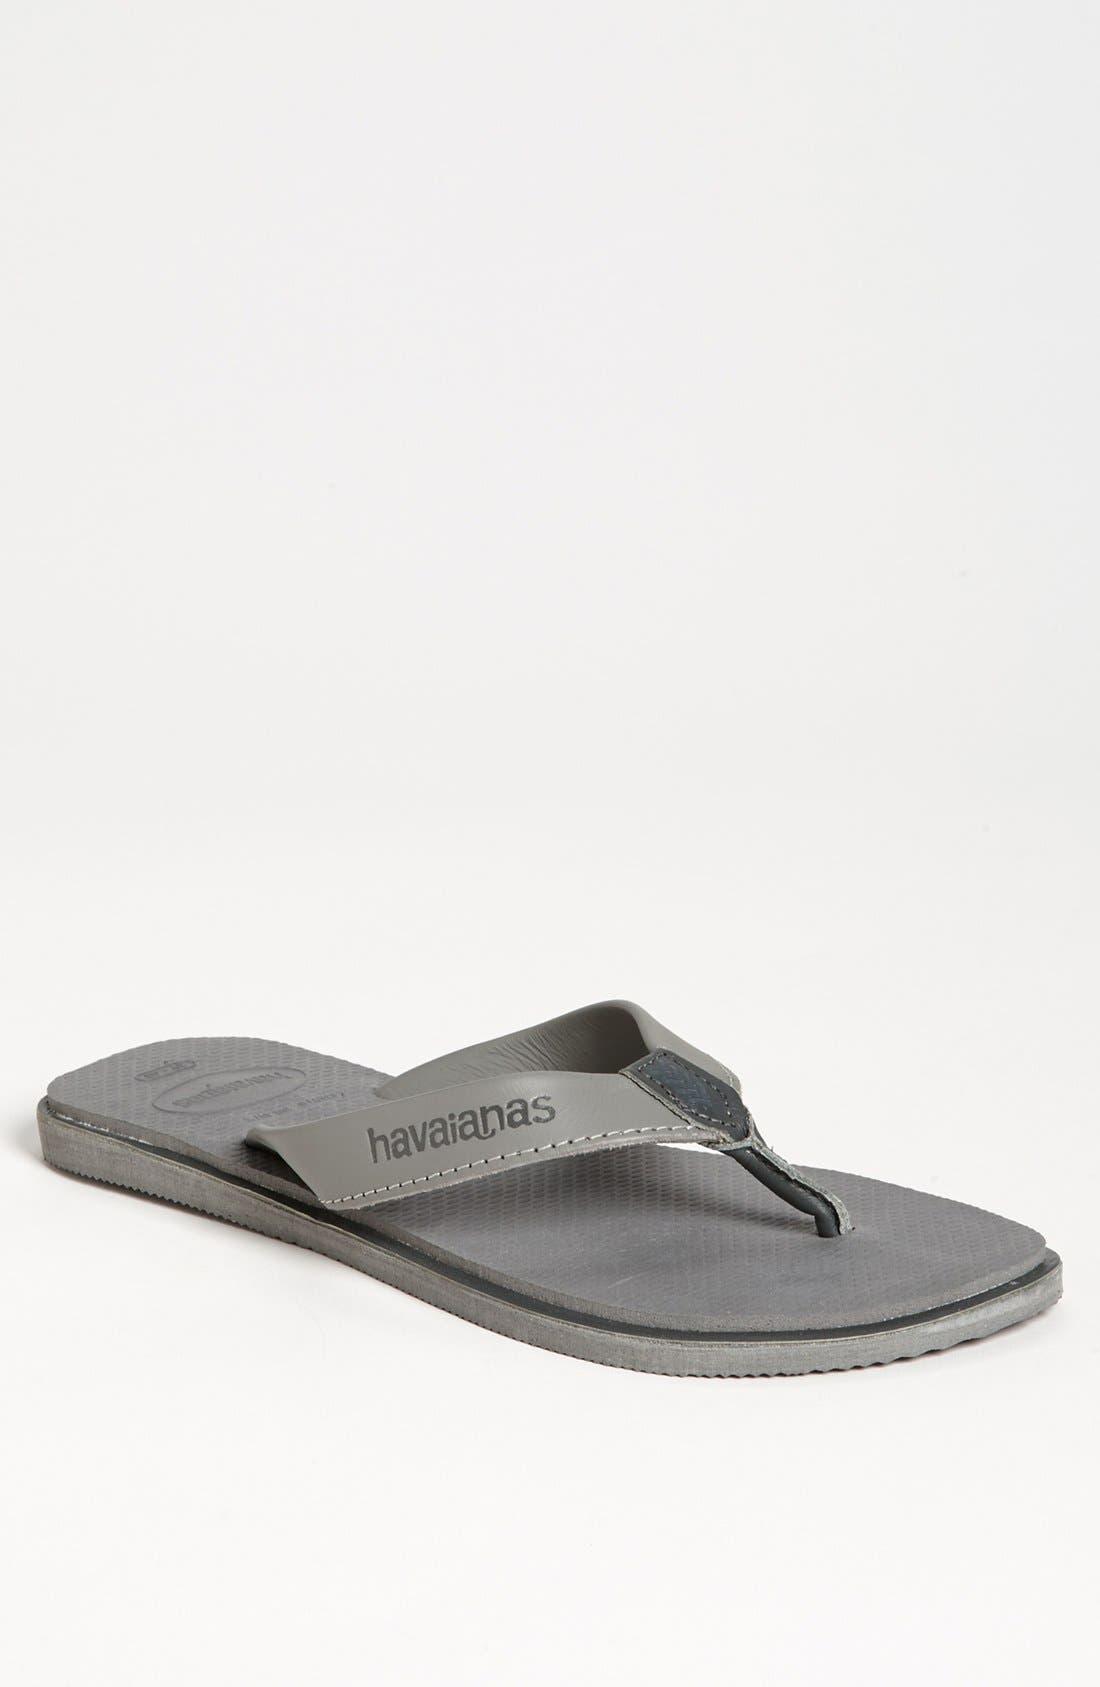 Alternate Image 1 Selected - Havianas 'Urban Premium' Flip Flop (Men)